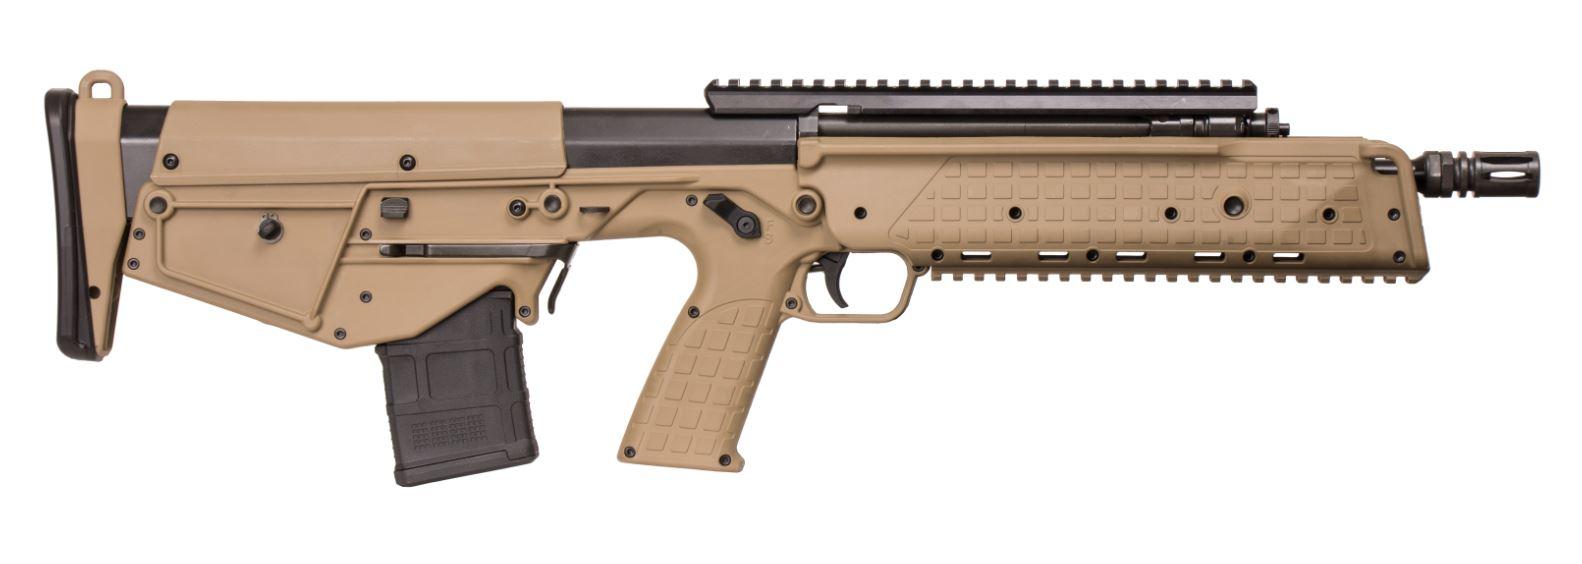 Keltec RDB 223 Rem | 5.56 NATO